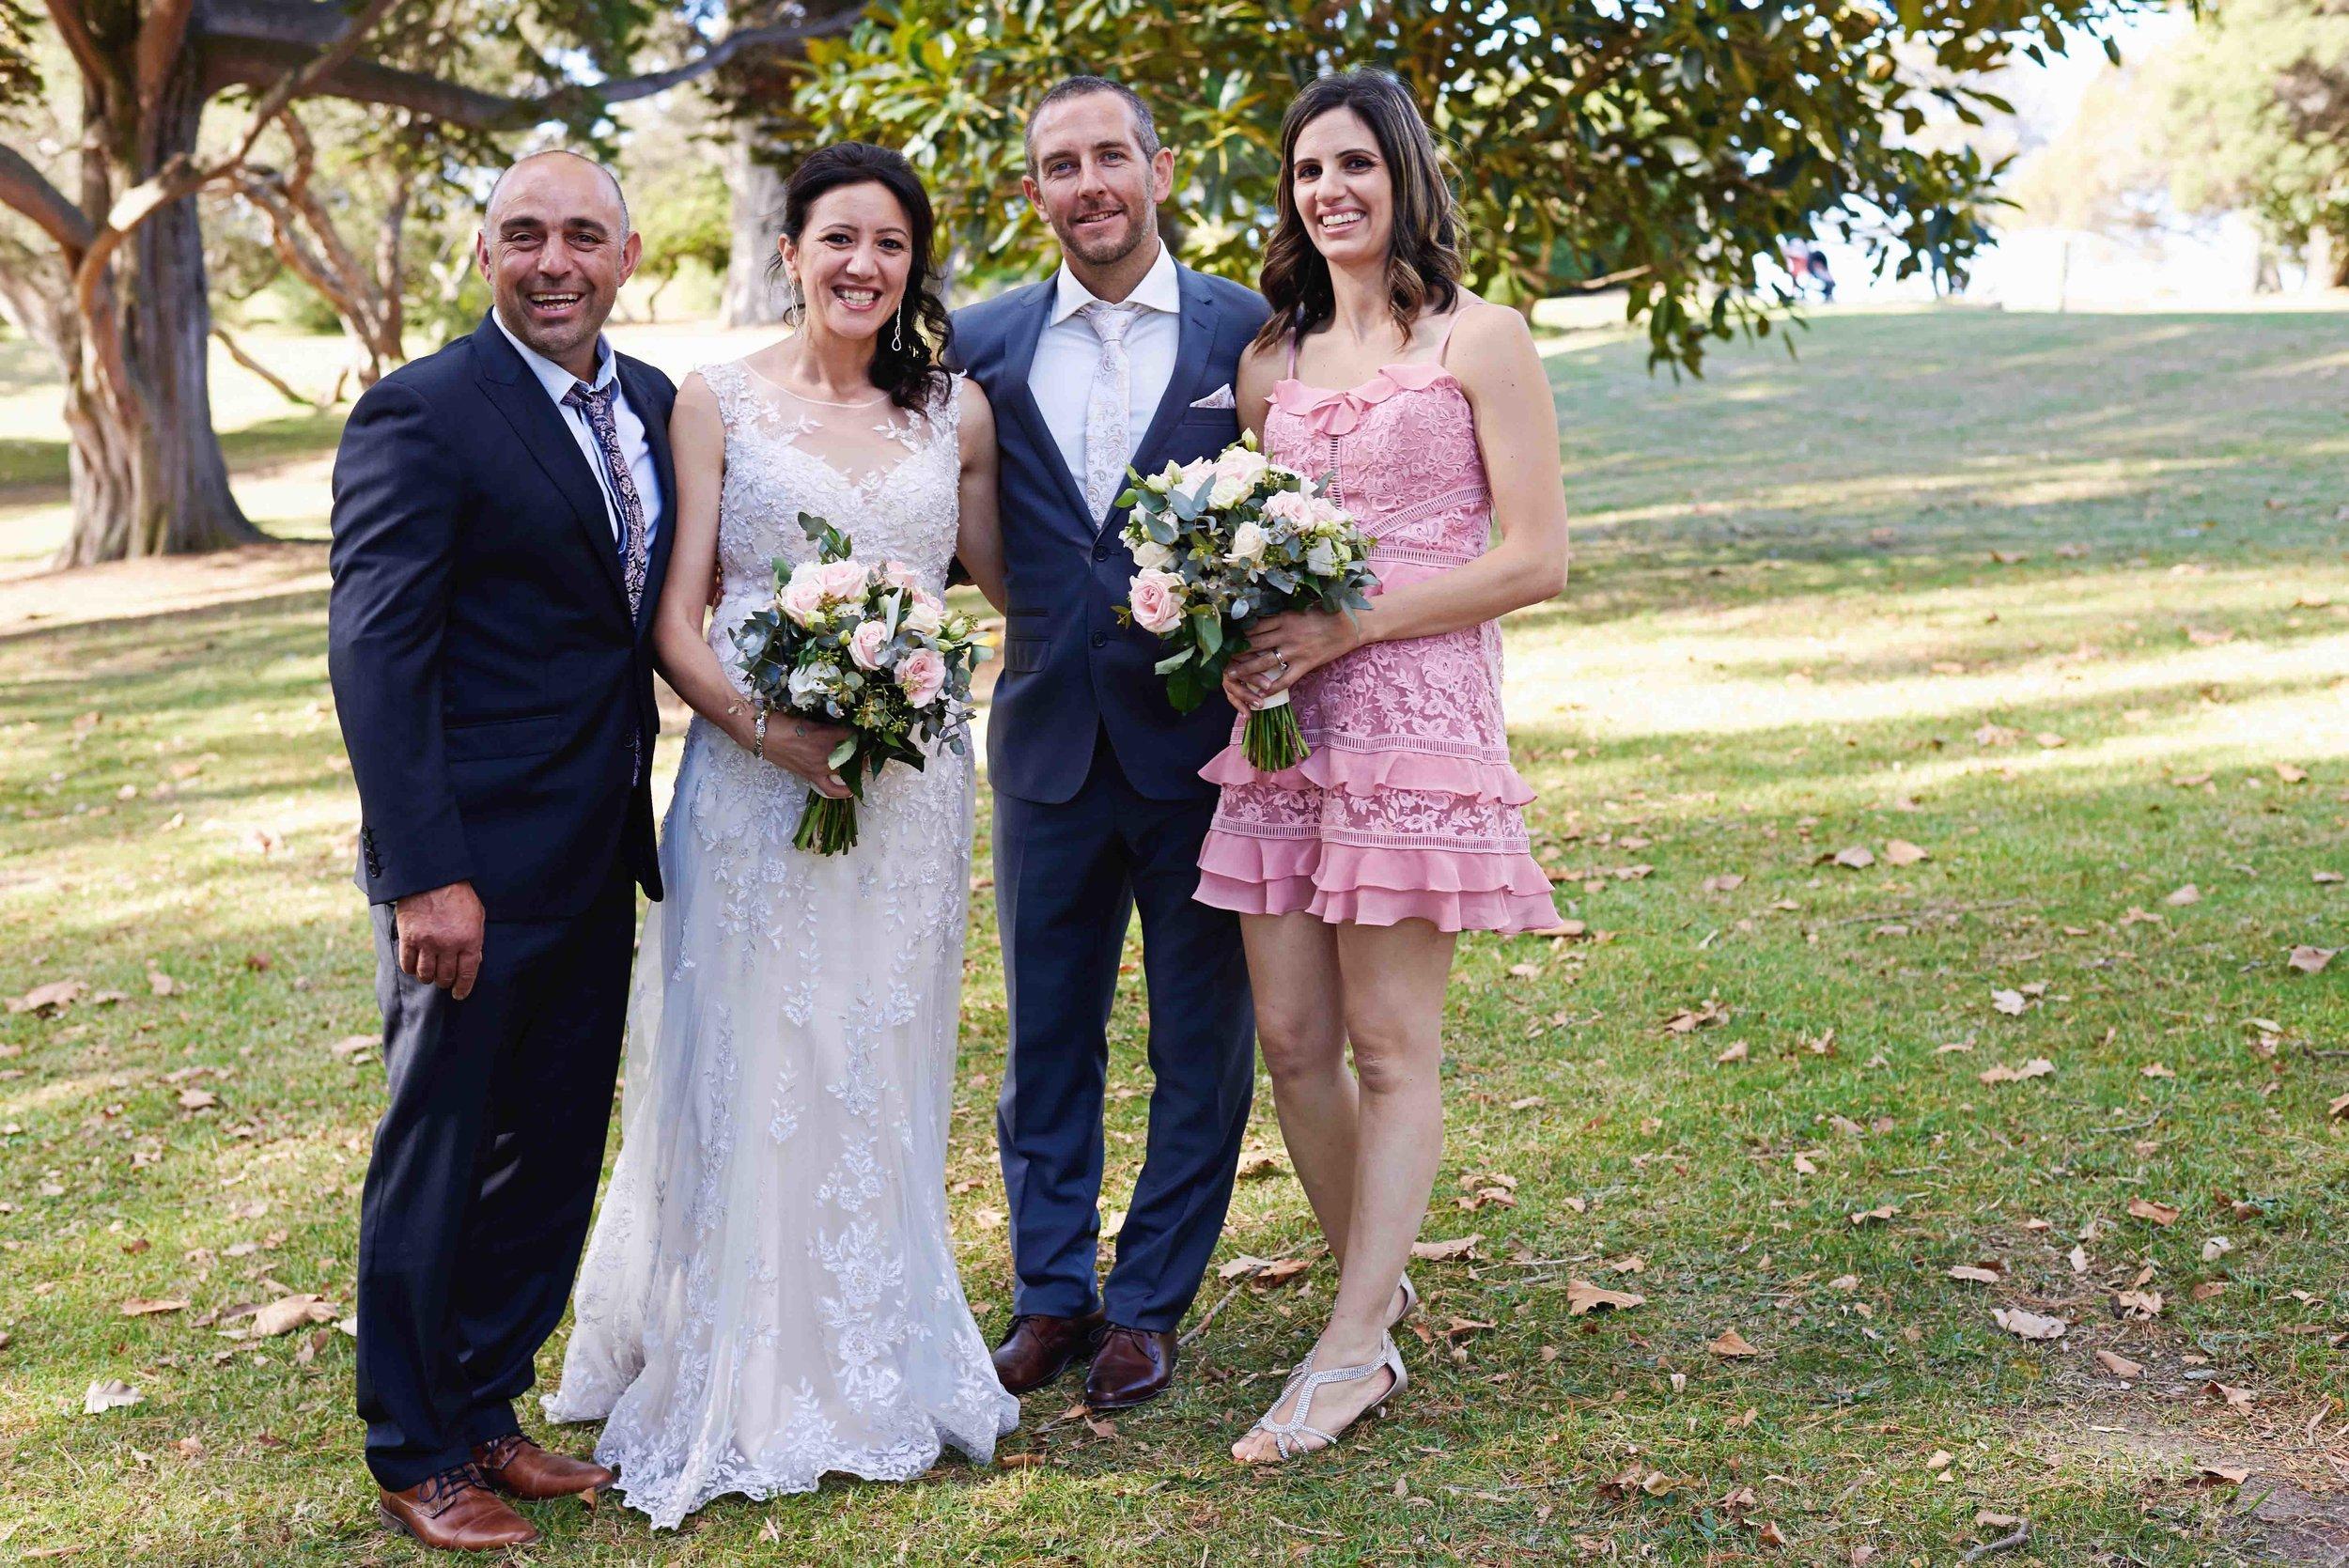 sorrento-wedding-photography-all-smiles-marissa-jade-photography-131.jpg